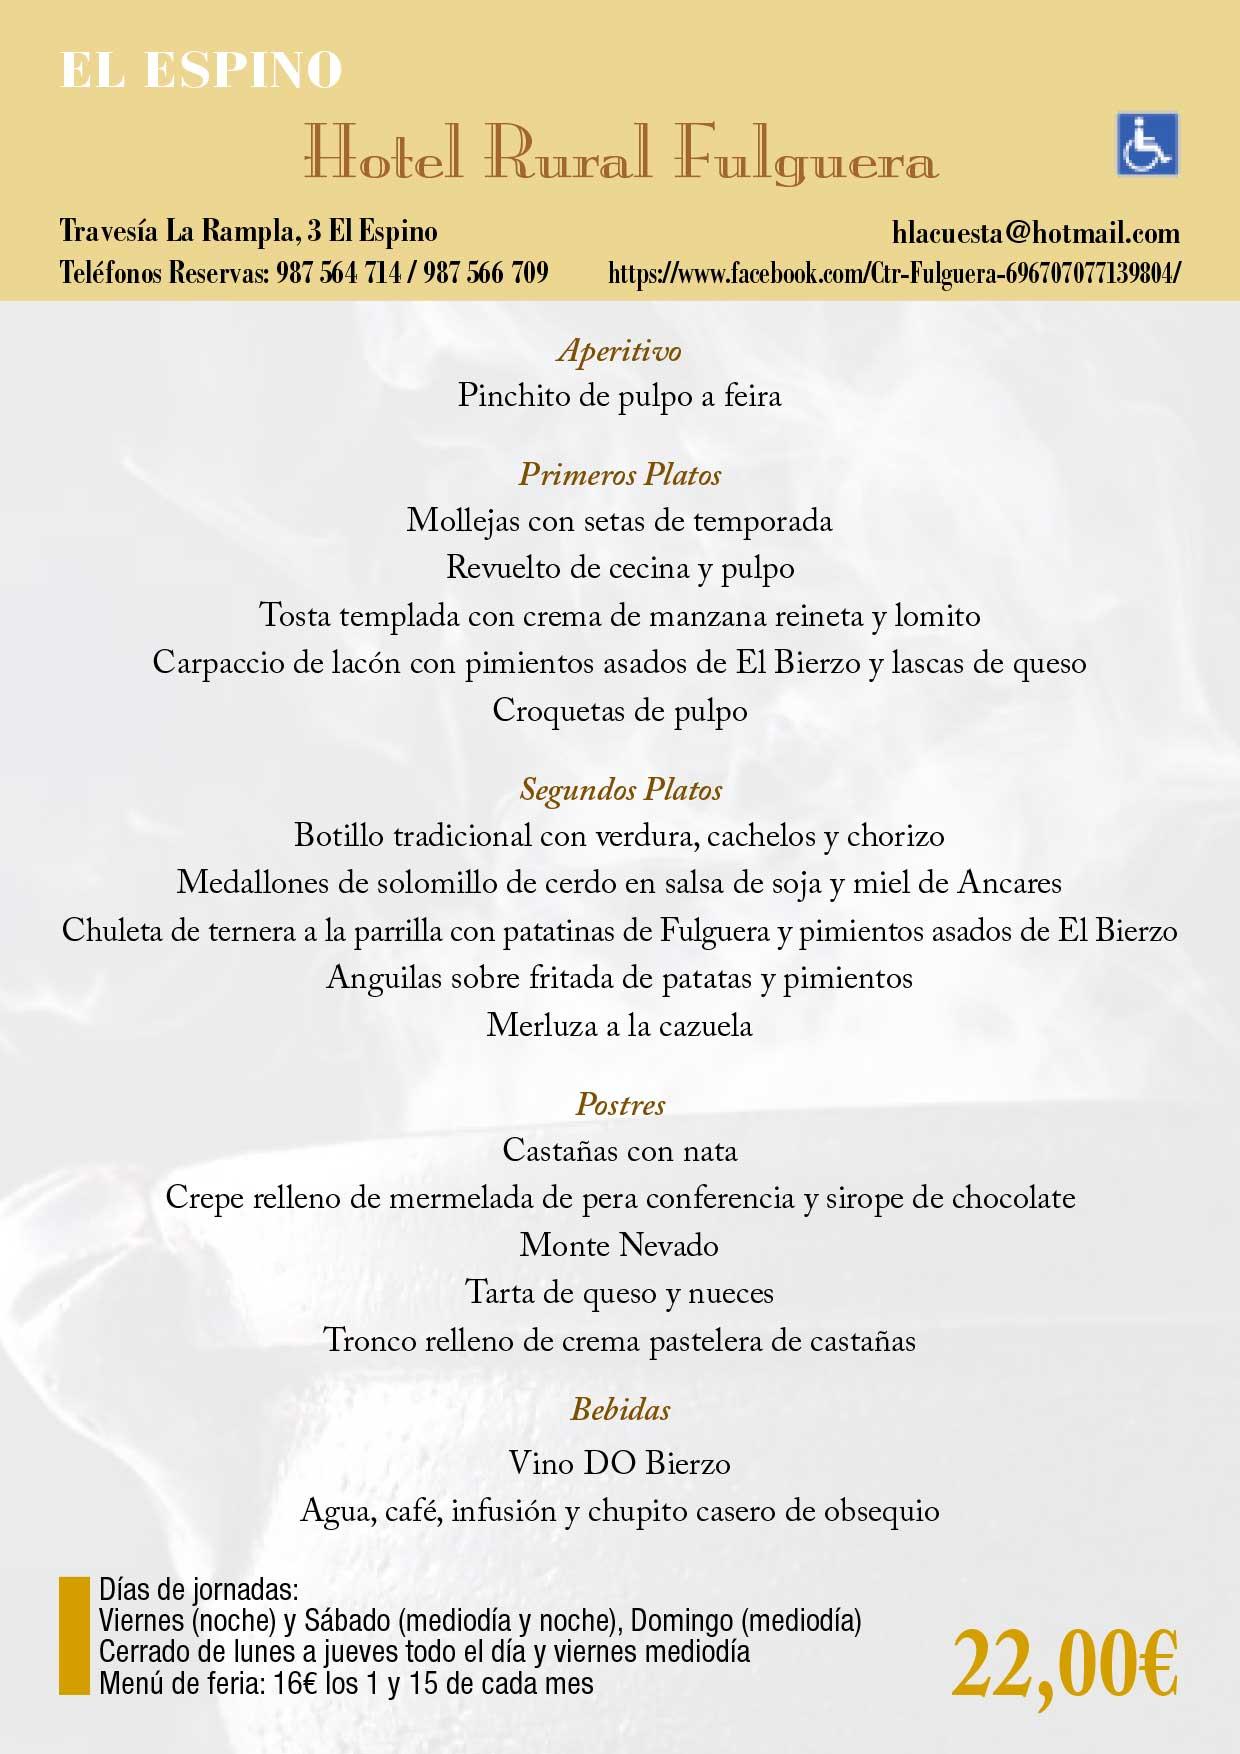 XXXIII Jornadas gastronómicas del Bierzo 2017. Restaurantes participantes 8